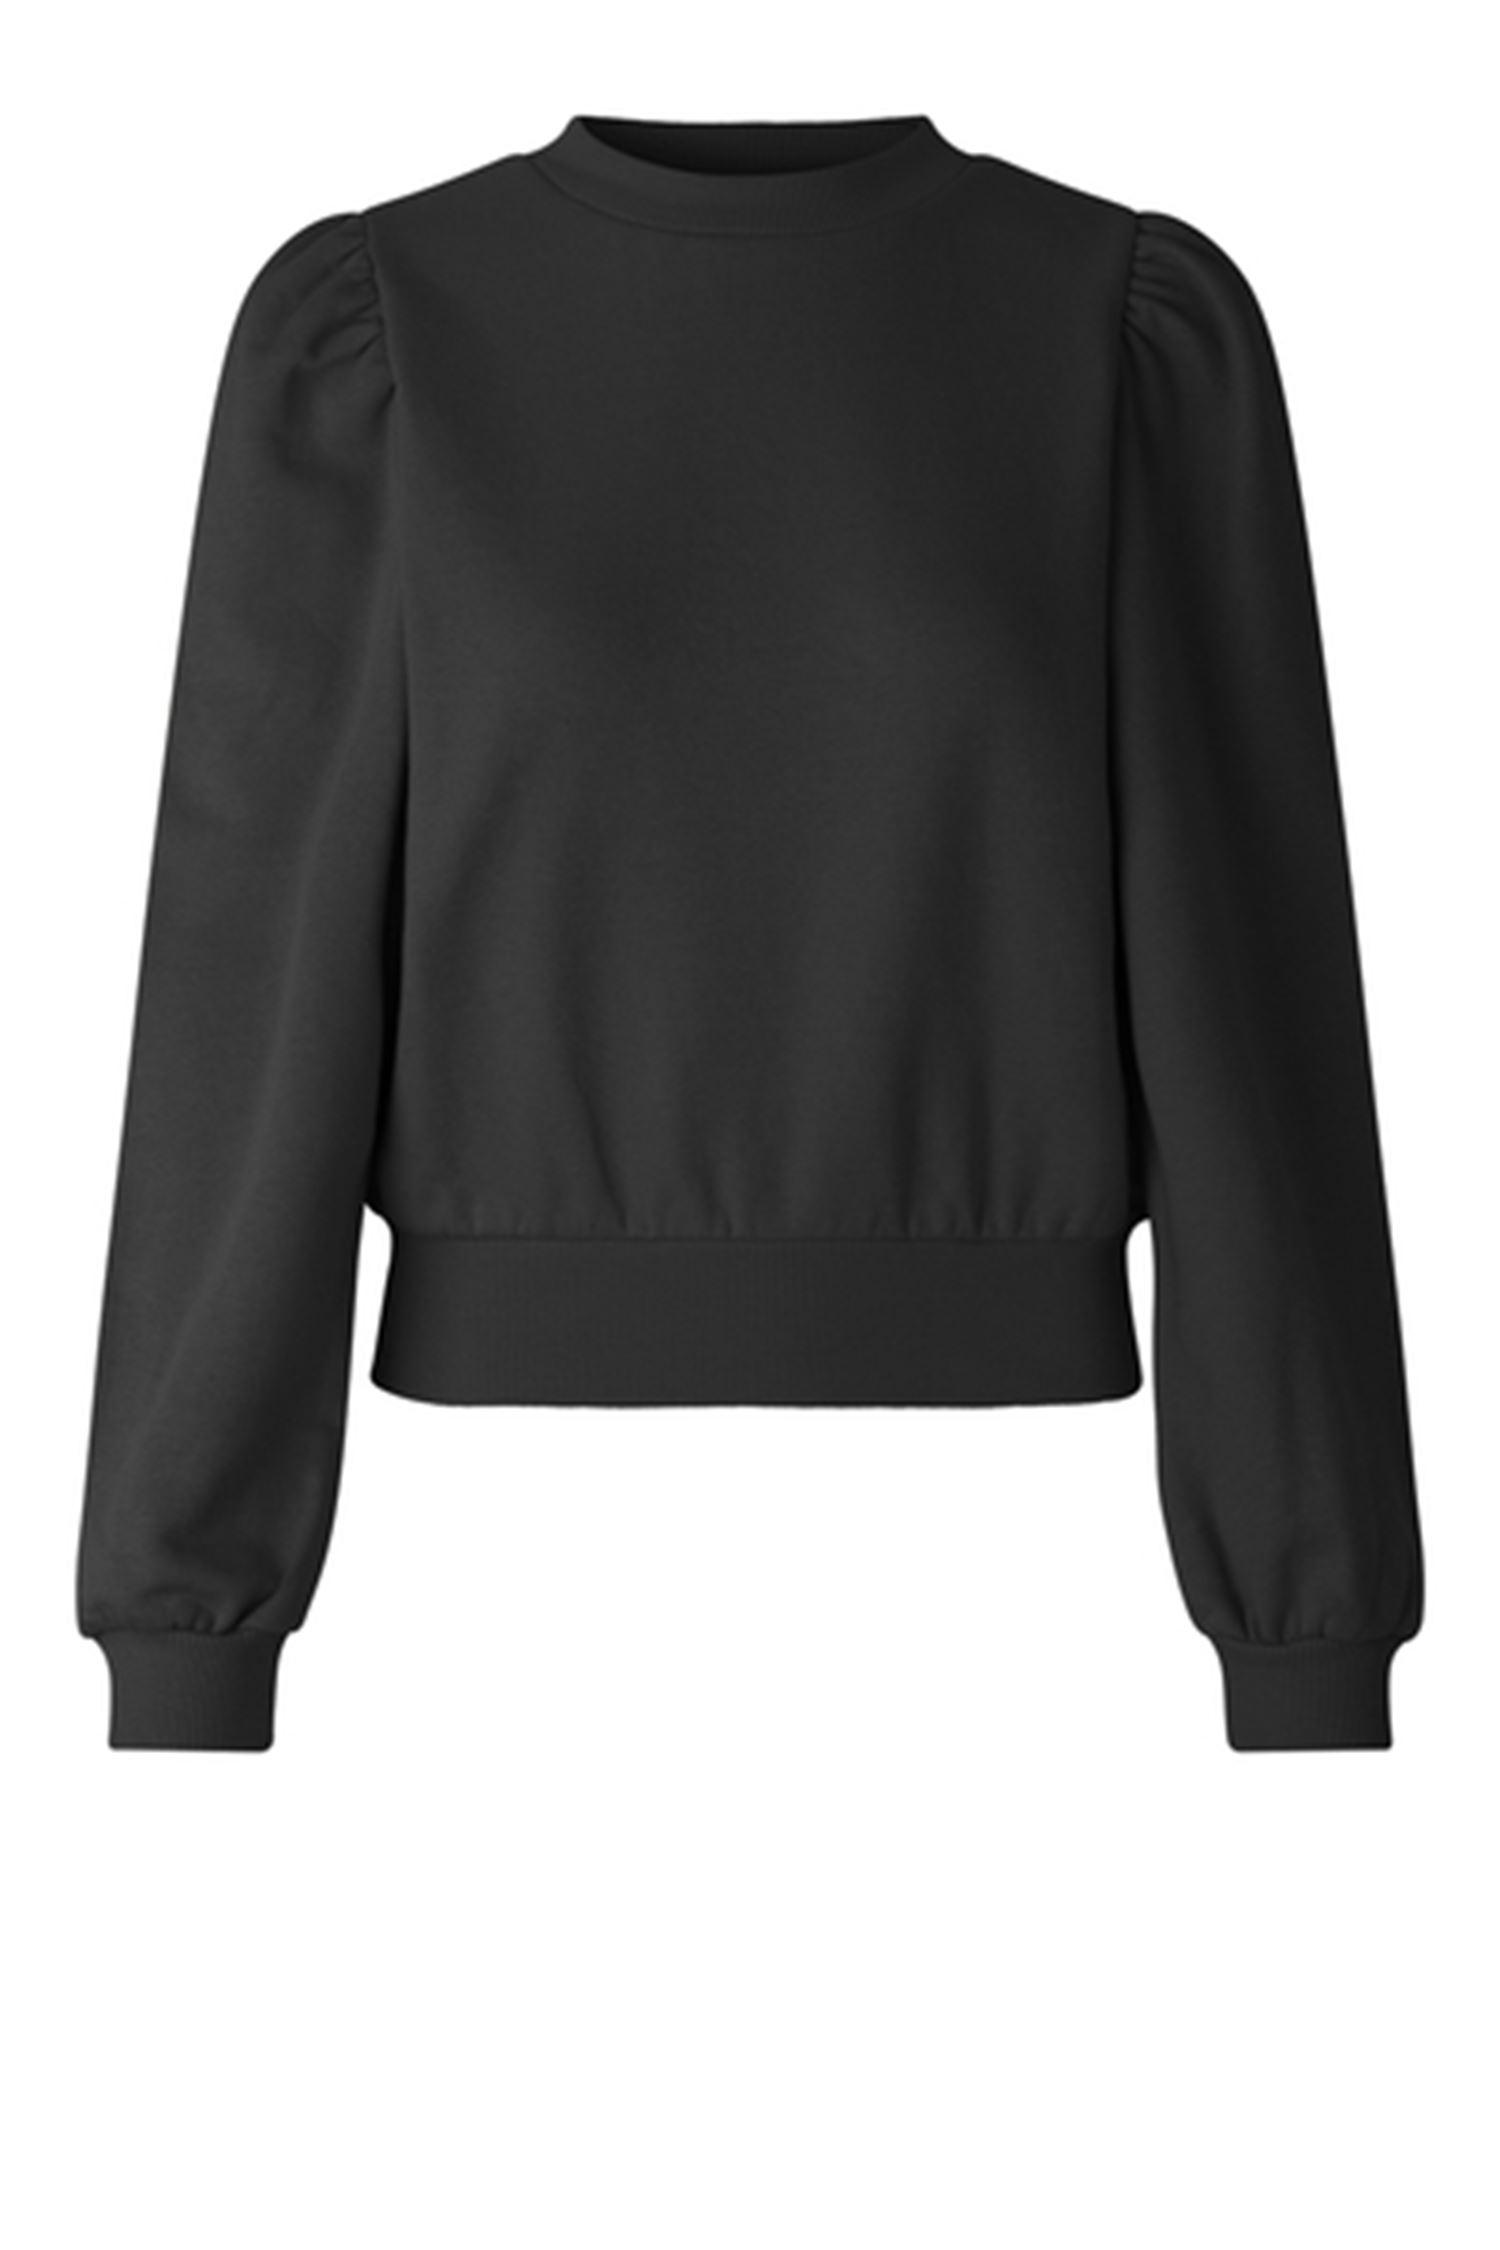 Second Female Carmella sweatshirt, black, x-small